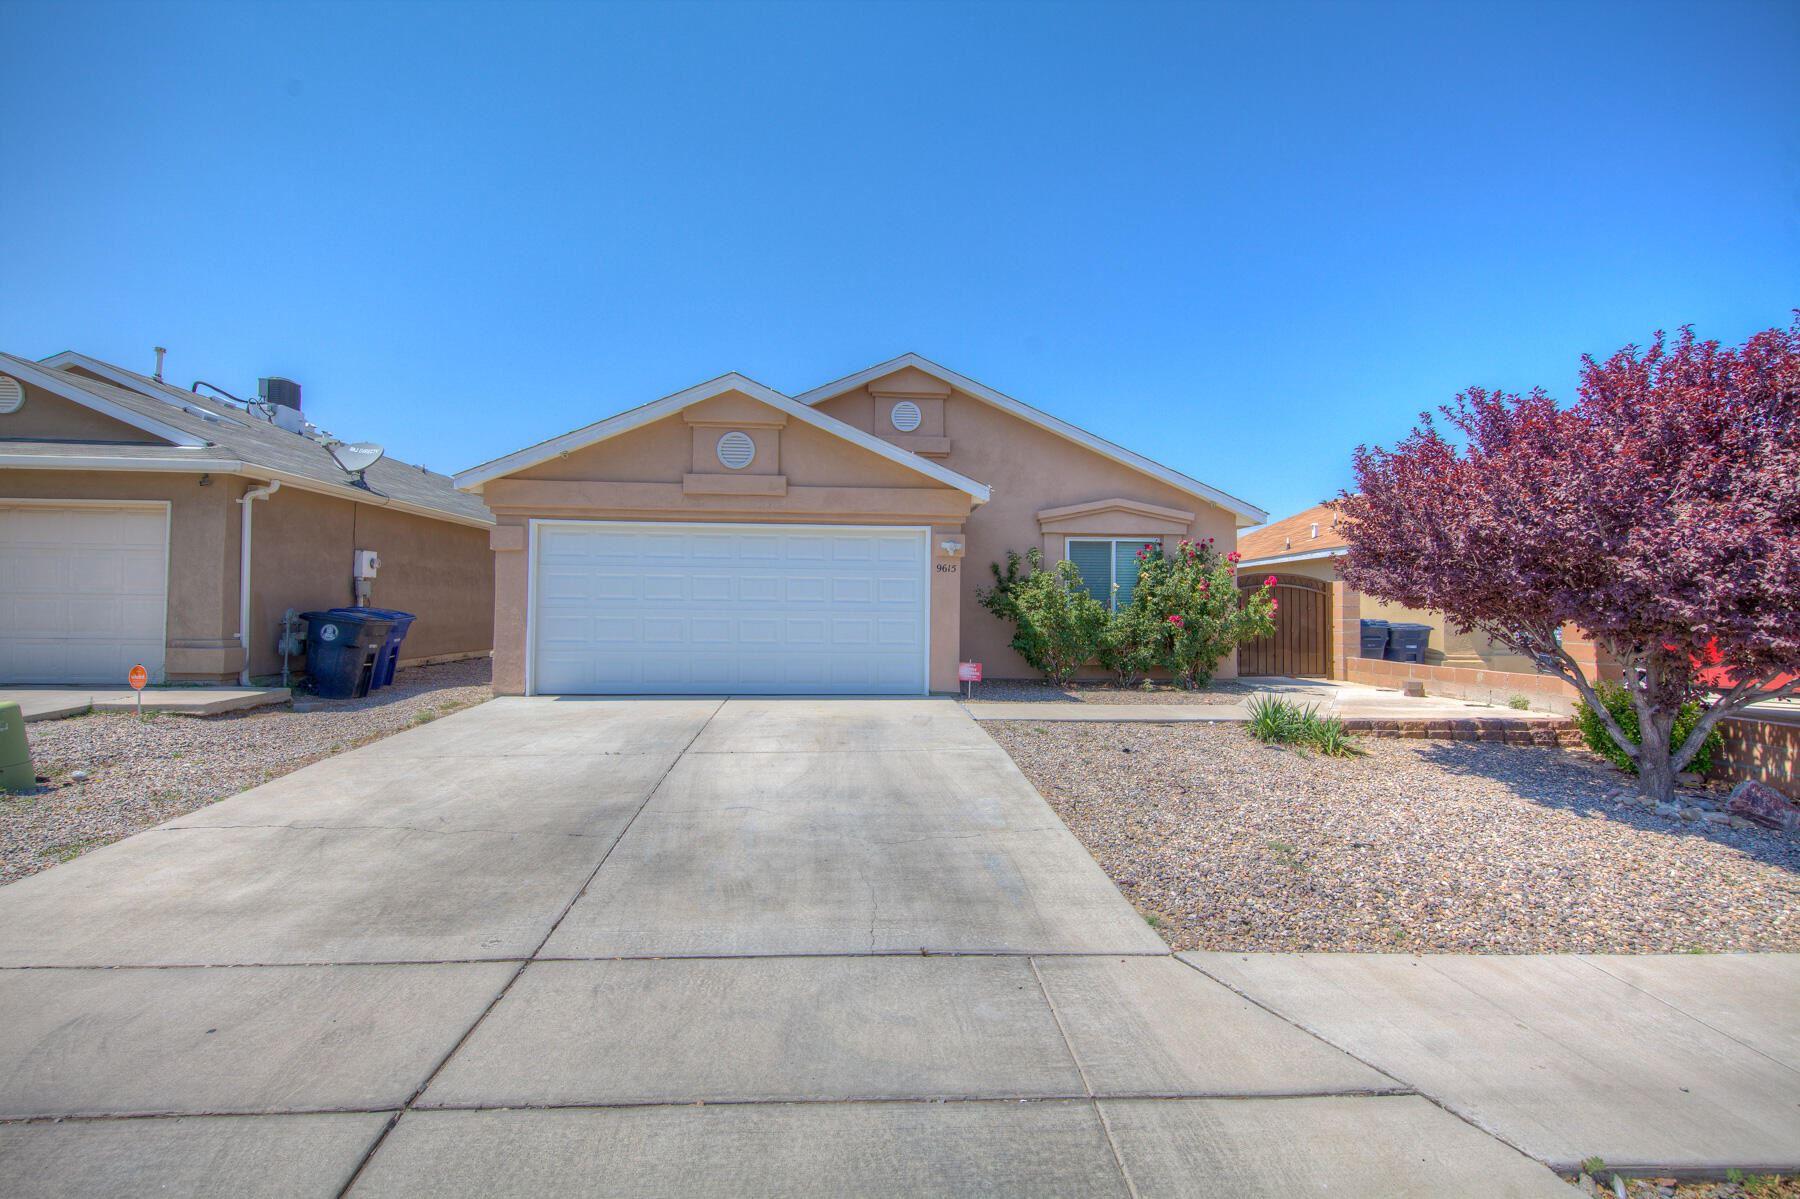 Photo of 9615 EL PATRON Road SW, Albuquerque, NM 87121 (MLS # 994821)